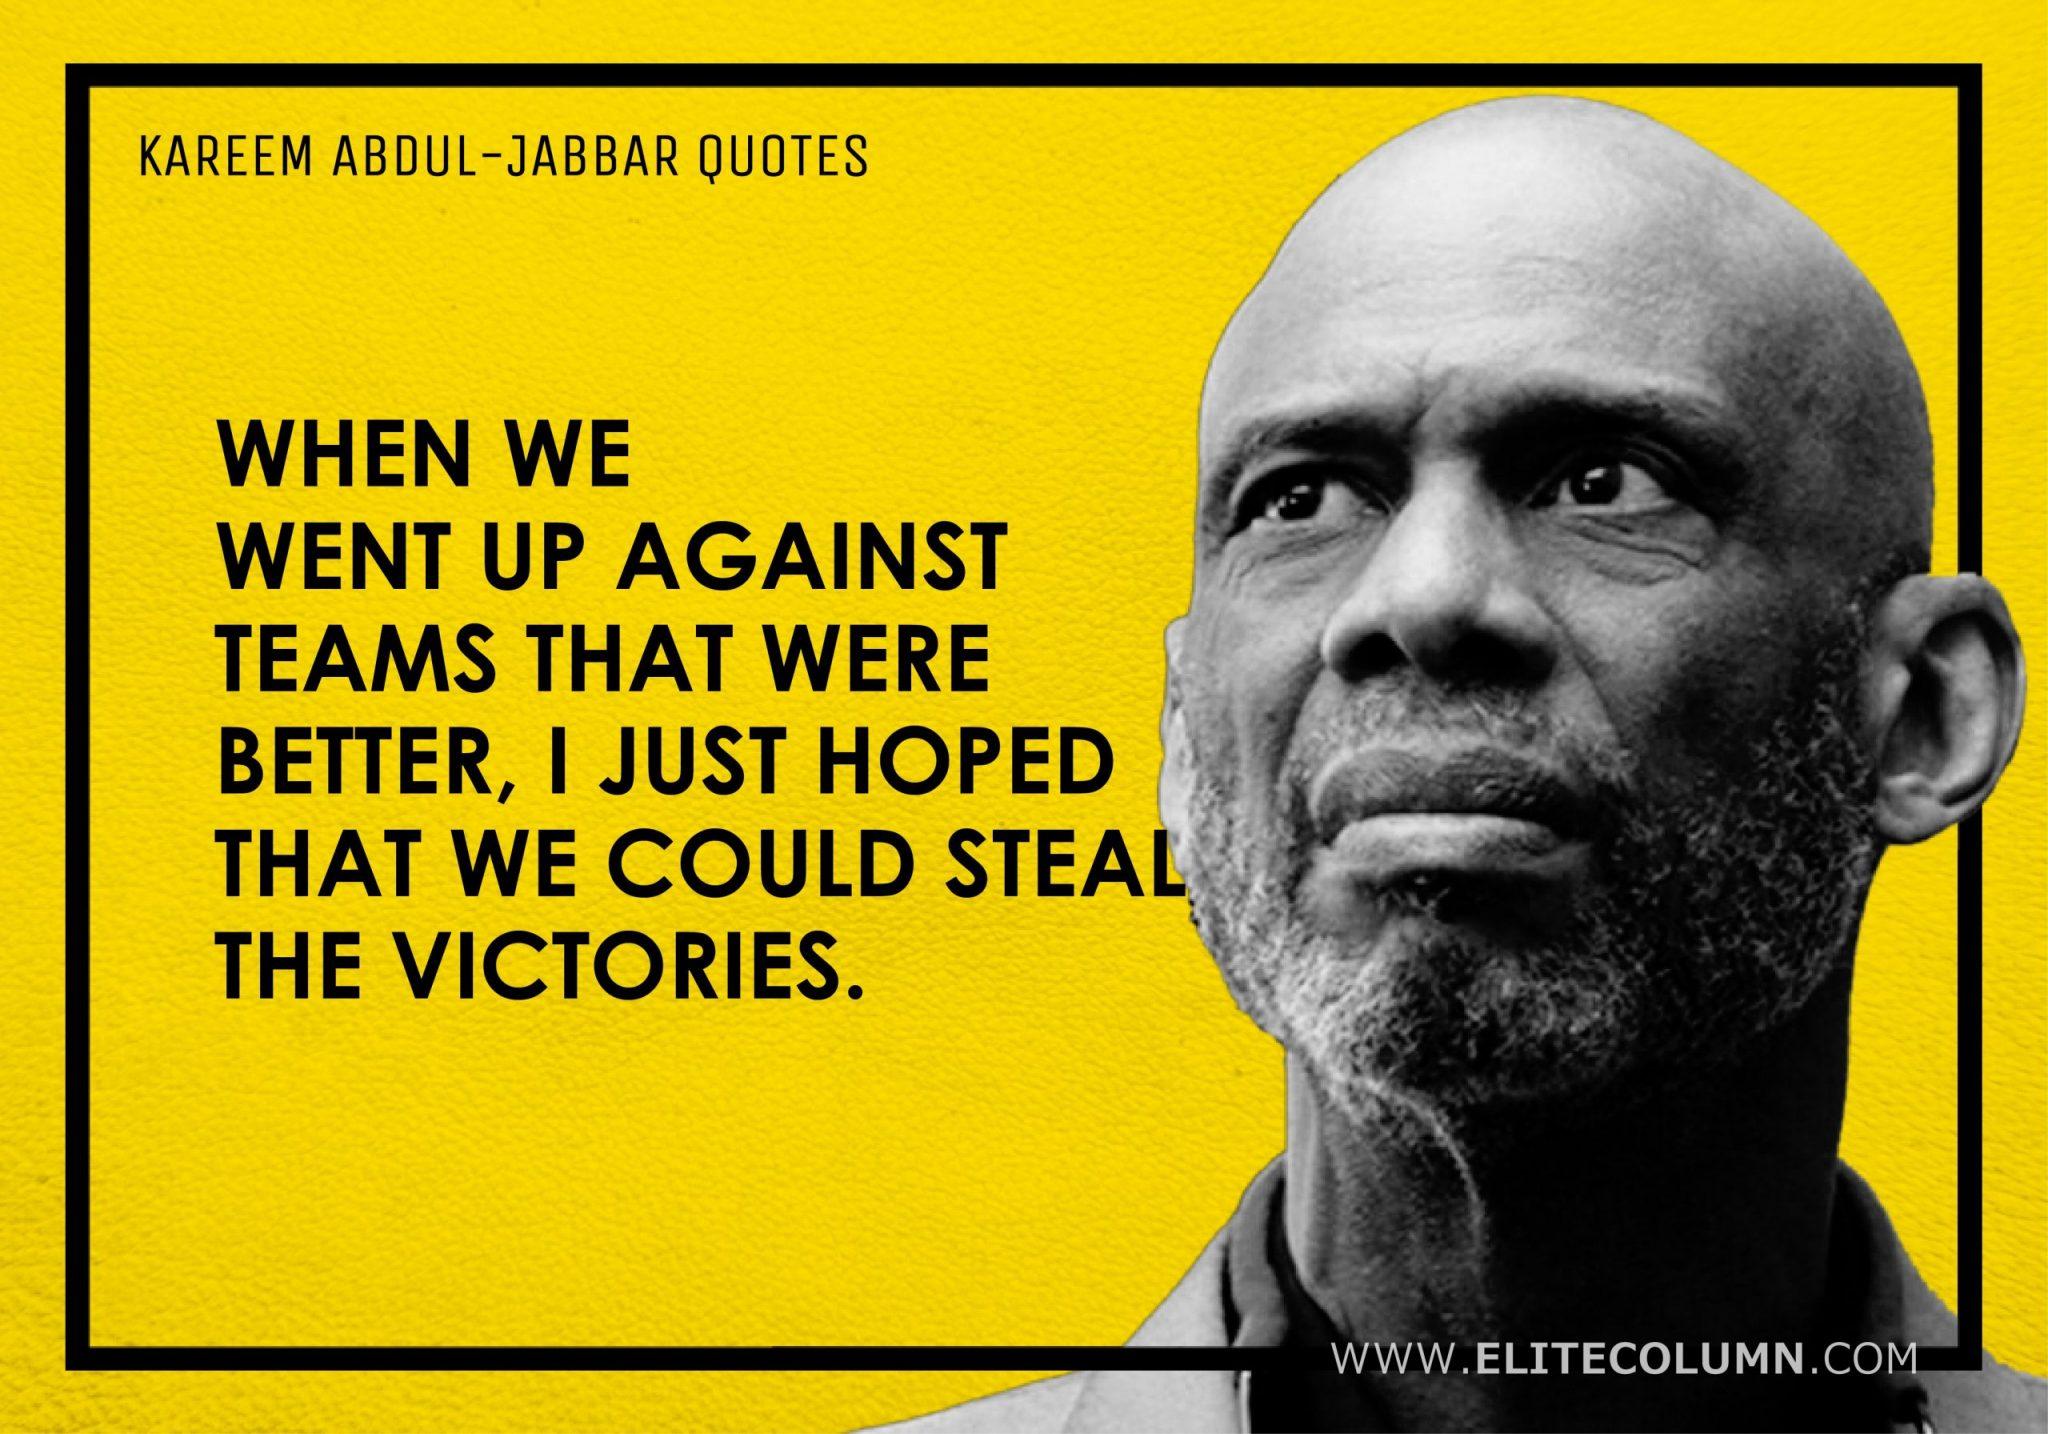 Kareem Abdul-Jabbar Quotes (10)